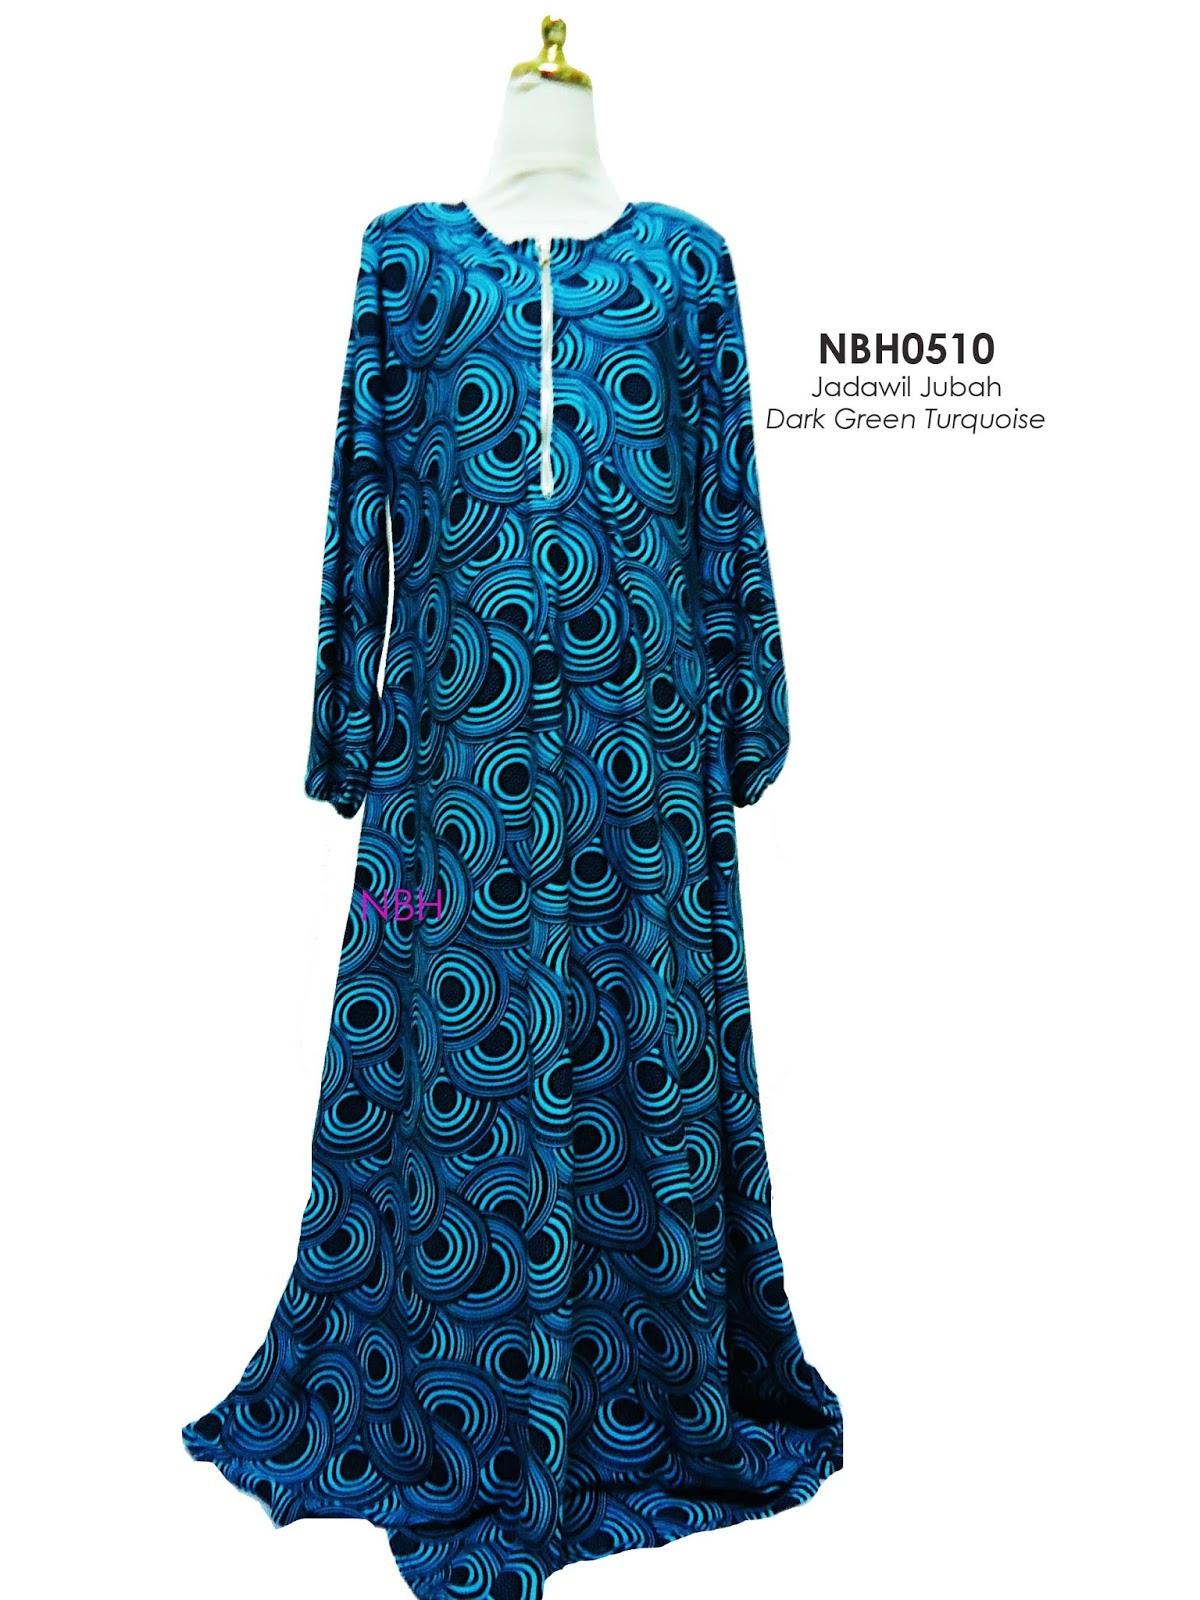 Norzi Beautilicious House NBH0510 JADAWIL JUBAH NURSING